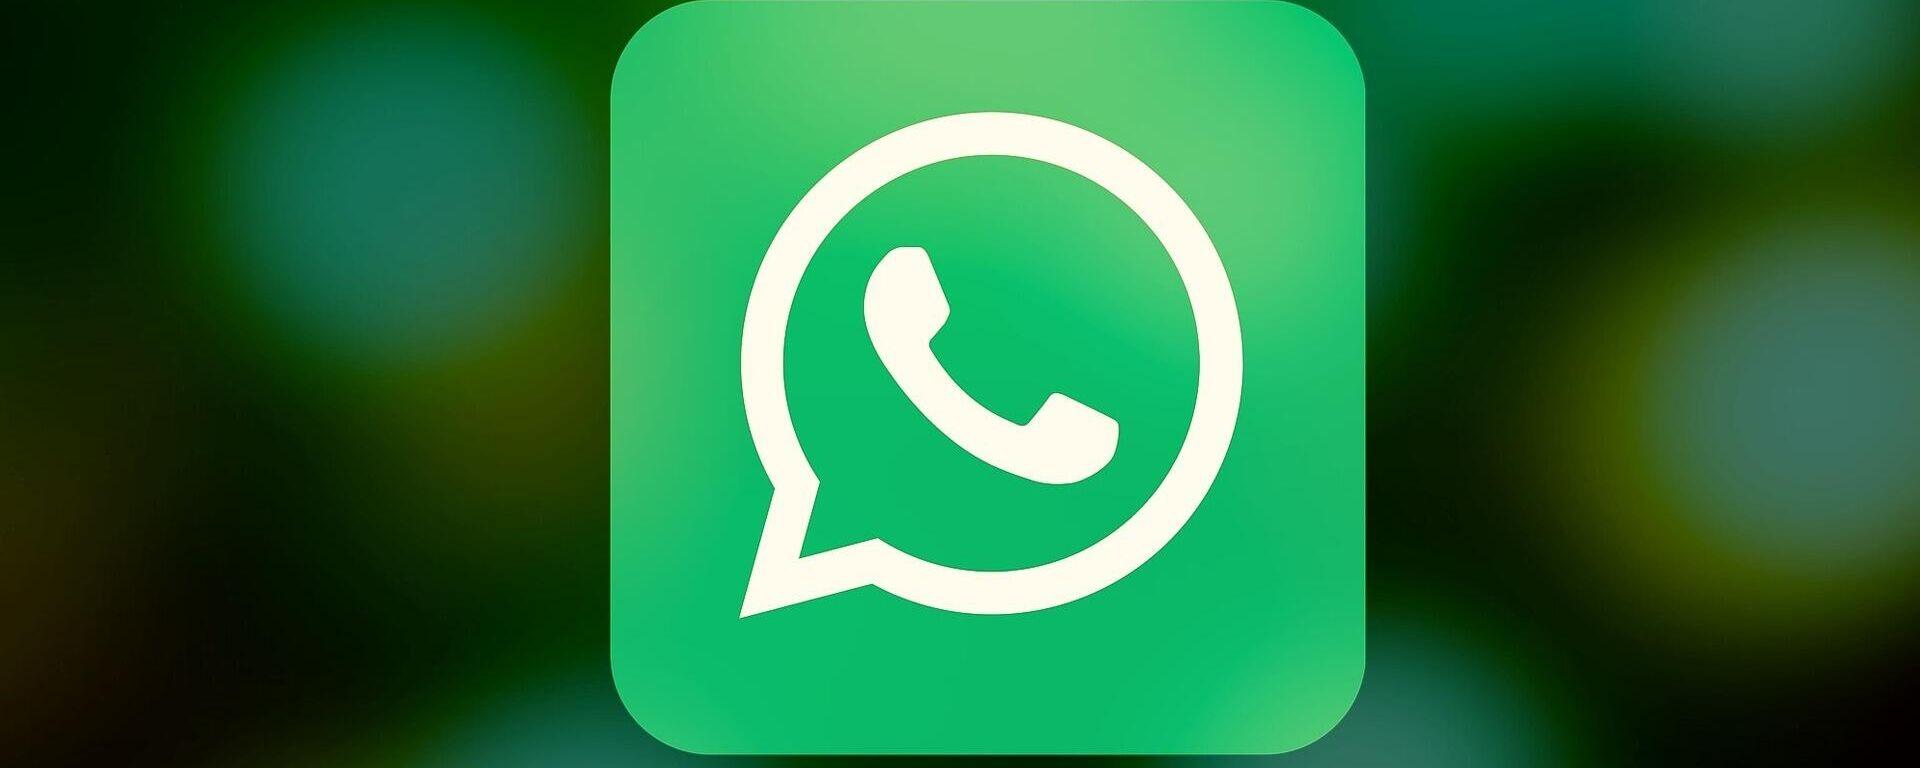 WhatsApp - Sputnik Mundo, 1920, 03.06.2021